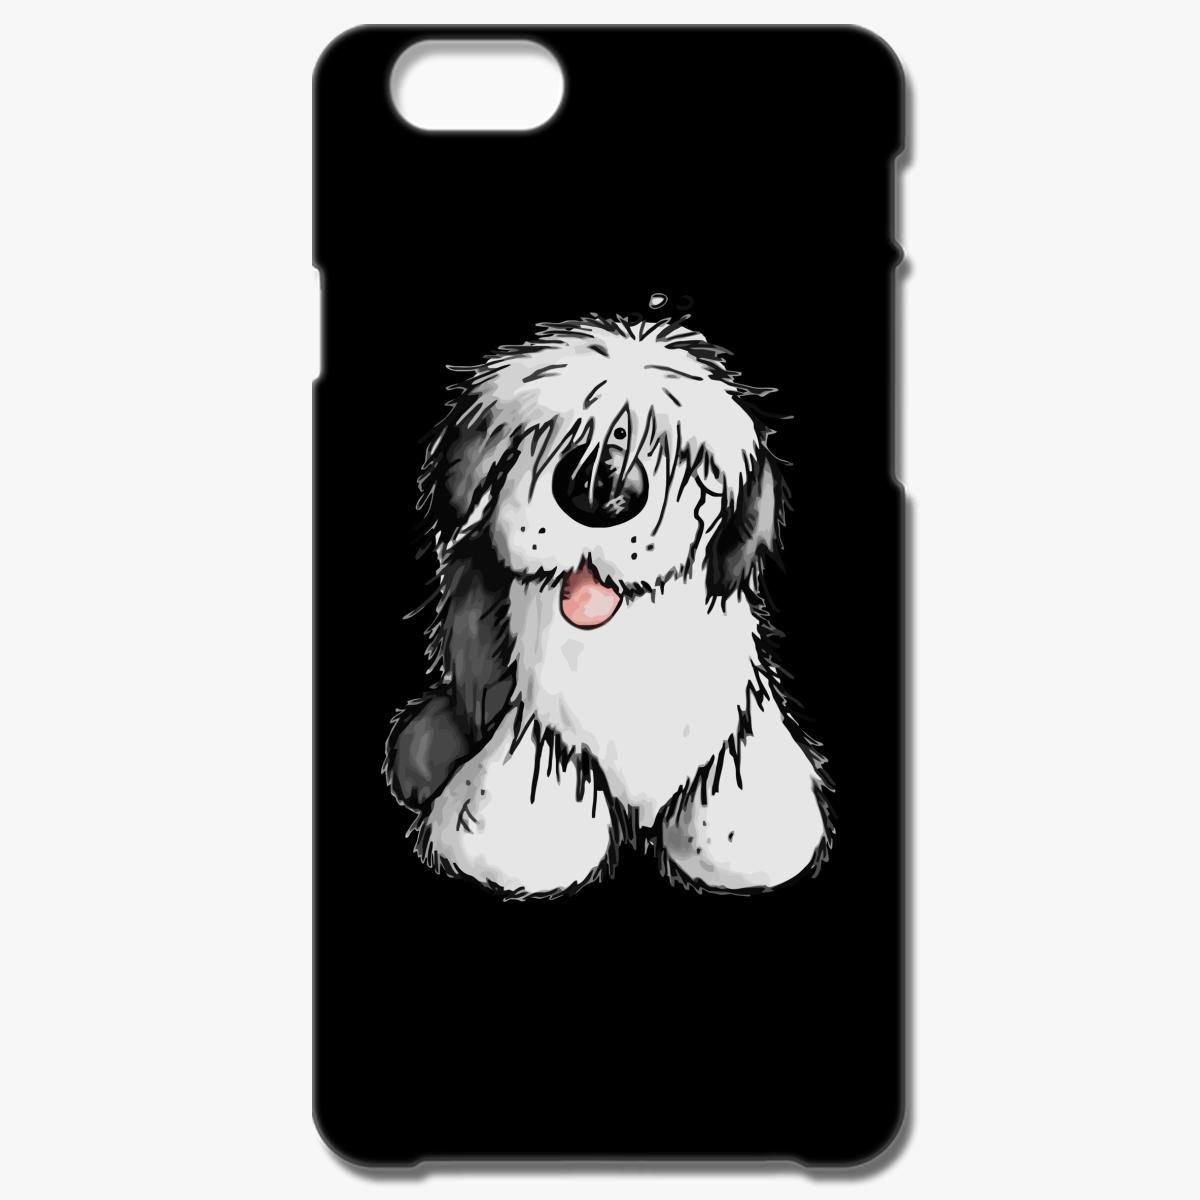 Bobbie Old English Sheepdog iPhone 6/6S Case | Customon.com